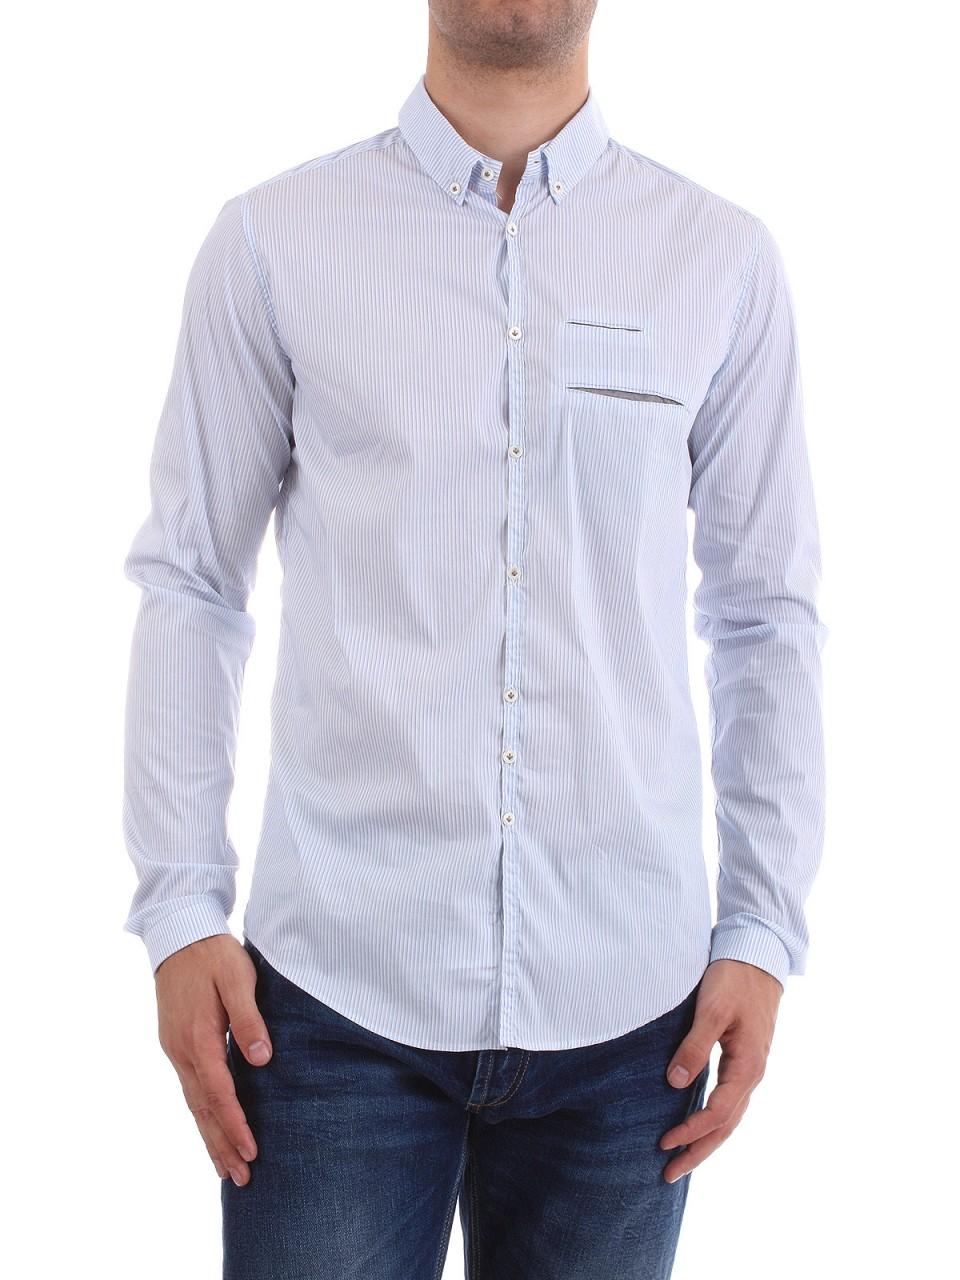 "AGLINI Herren Hemd ""Marino"", weiß-blau gestreift"